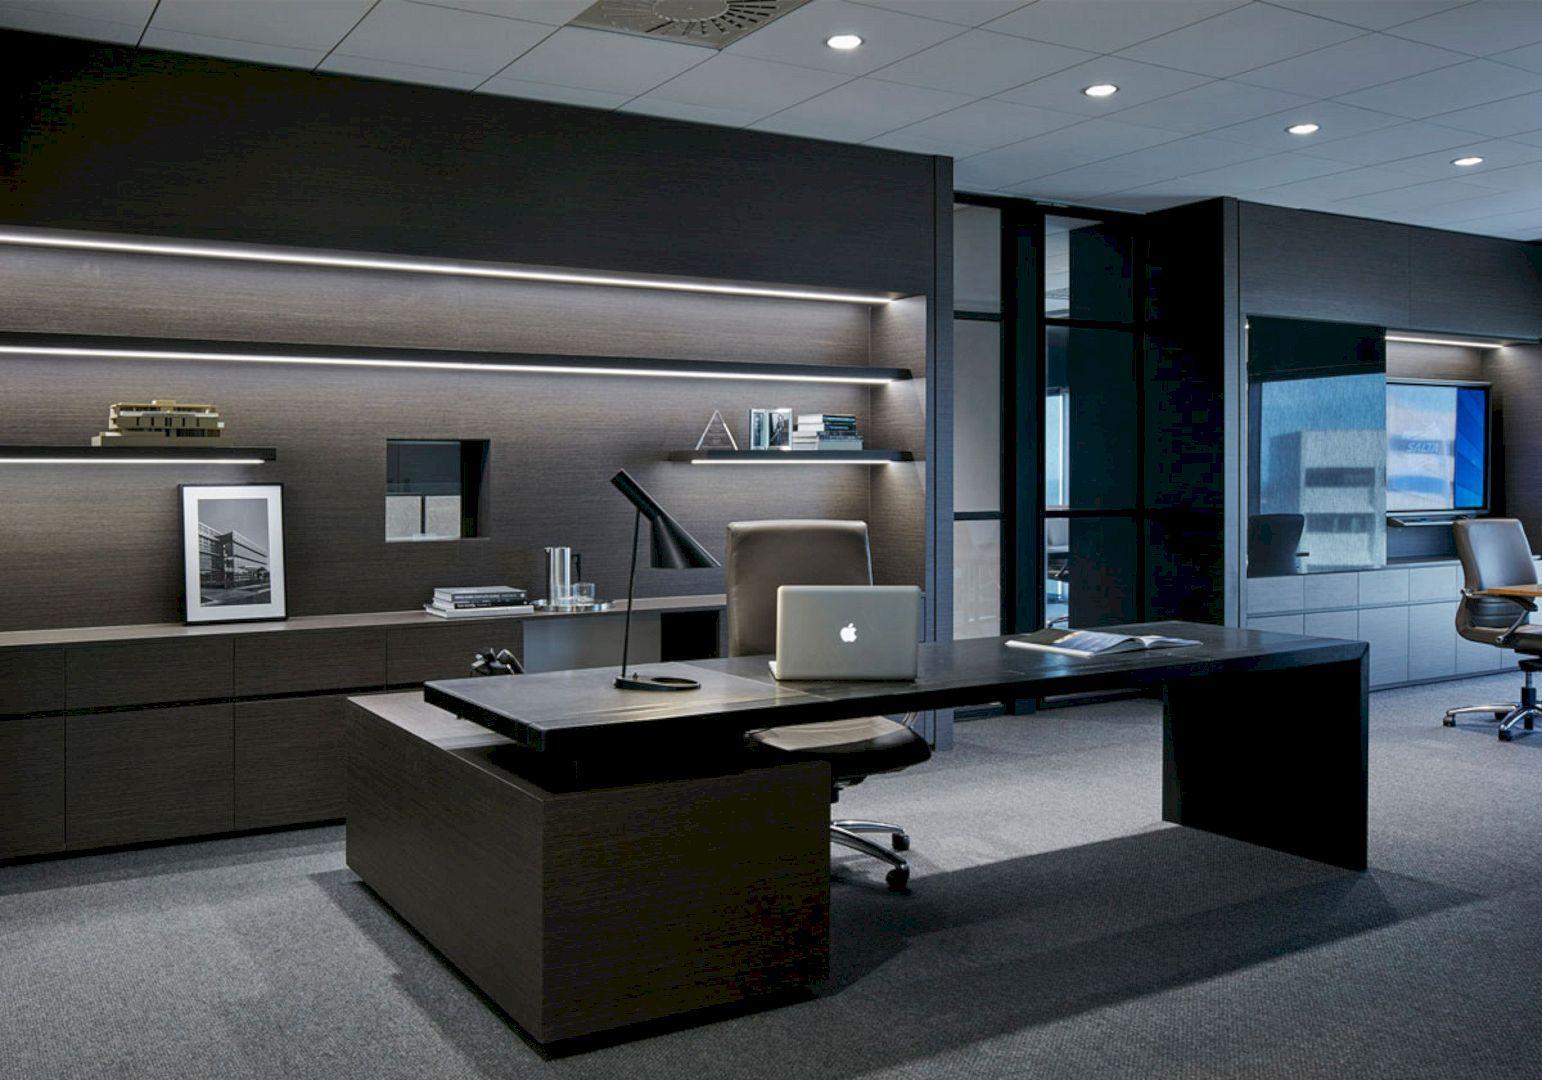 Tuscan Furniture Designs Modern House Inside Html on